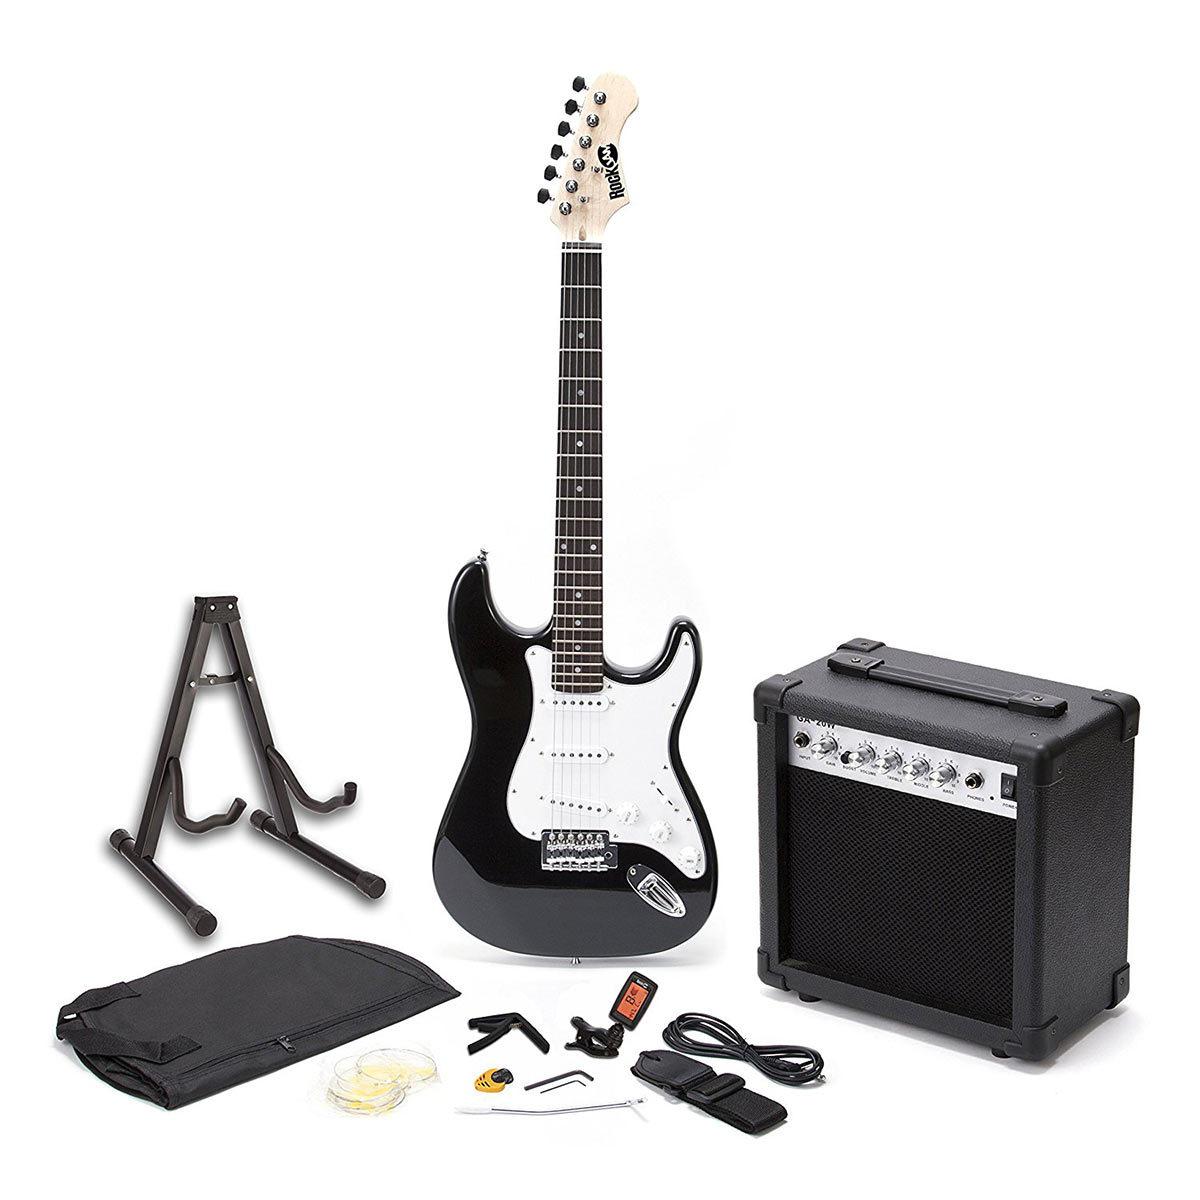 RockJam Electric Guitar Bundle in Black, RJEG01-SK-BK - £79.99 @ Costco